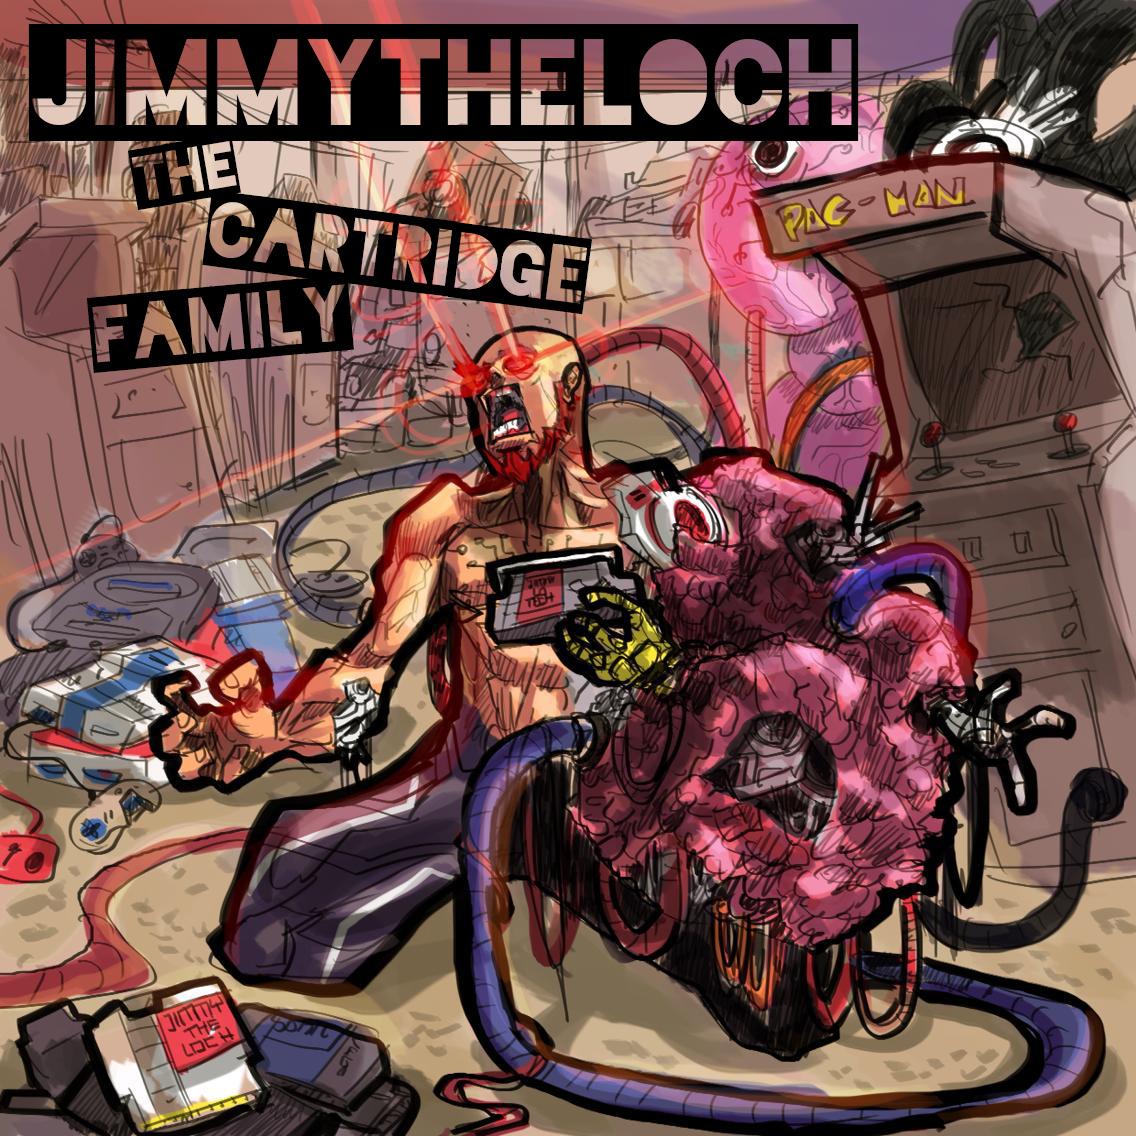 jimmytheloch-super-mario-new-york-hip-hop